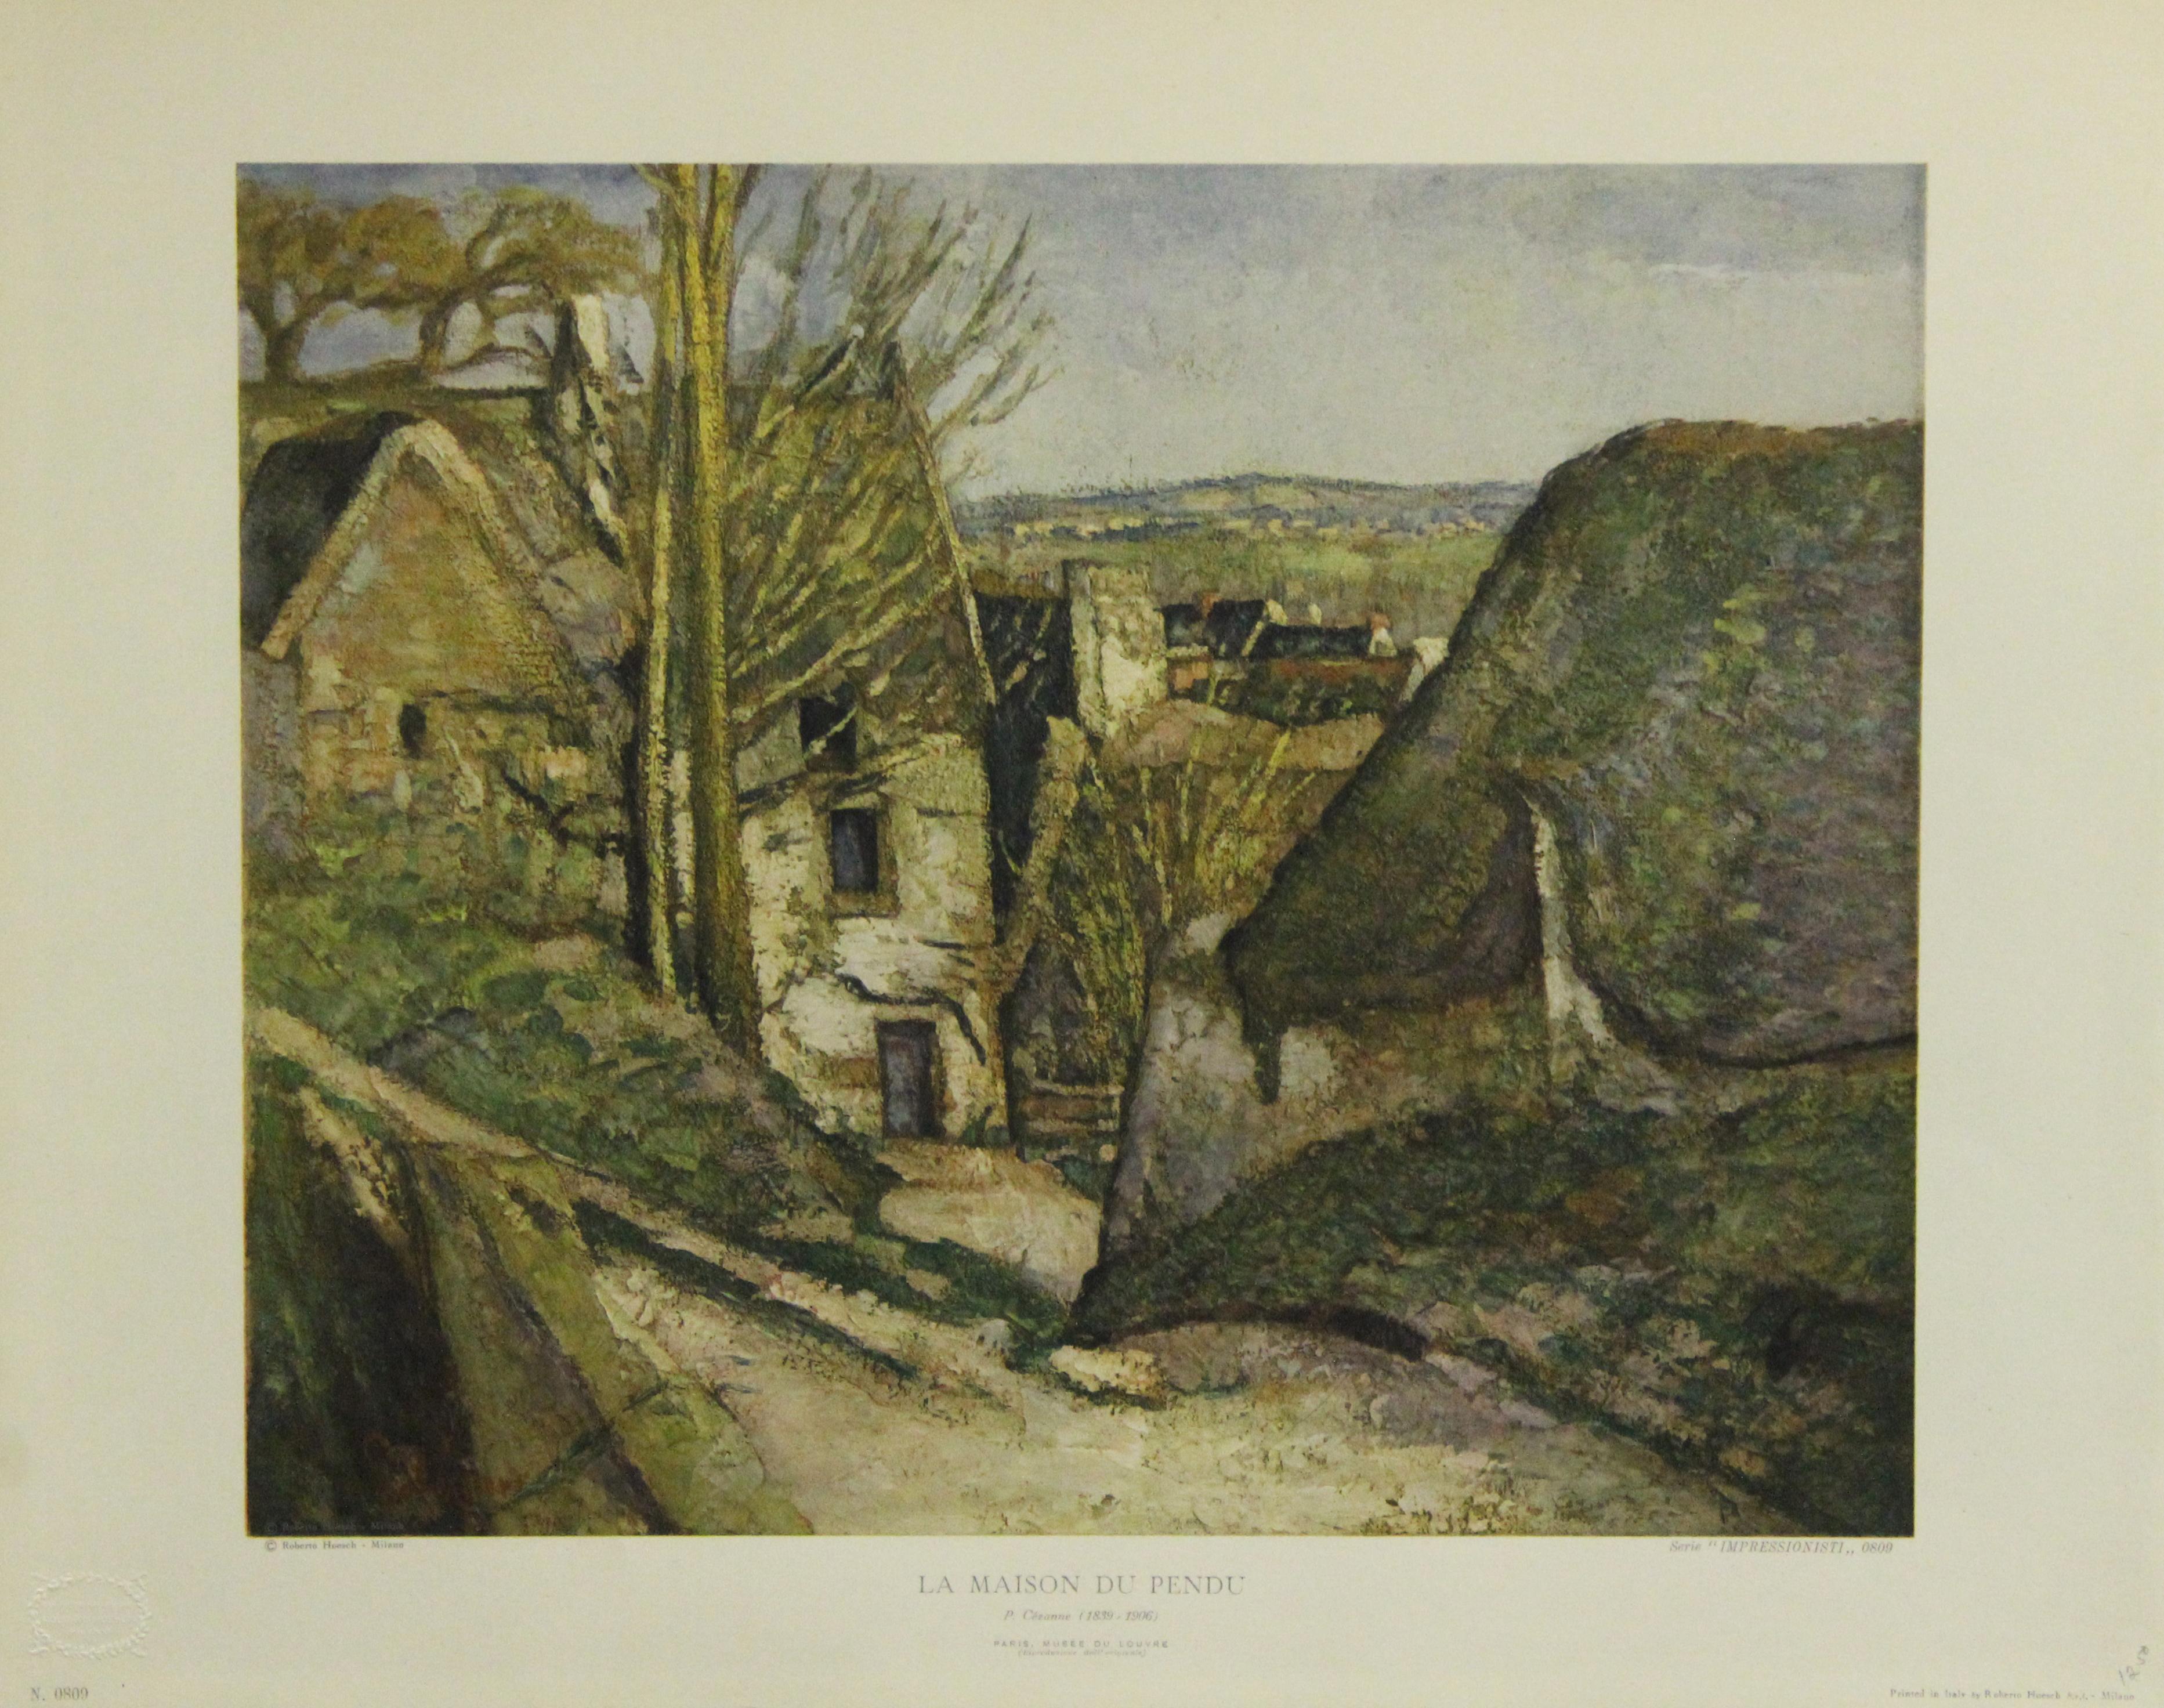 La Maison Du Pendu. Printed in Italy by Roberto Hoesch-Milano